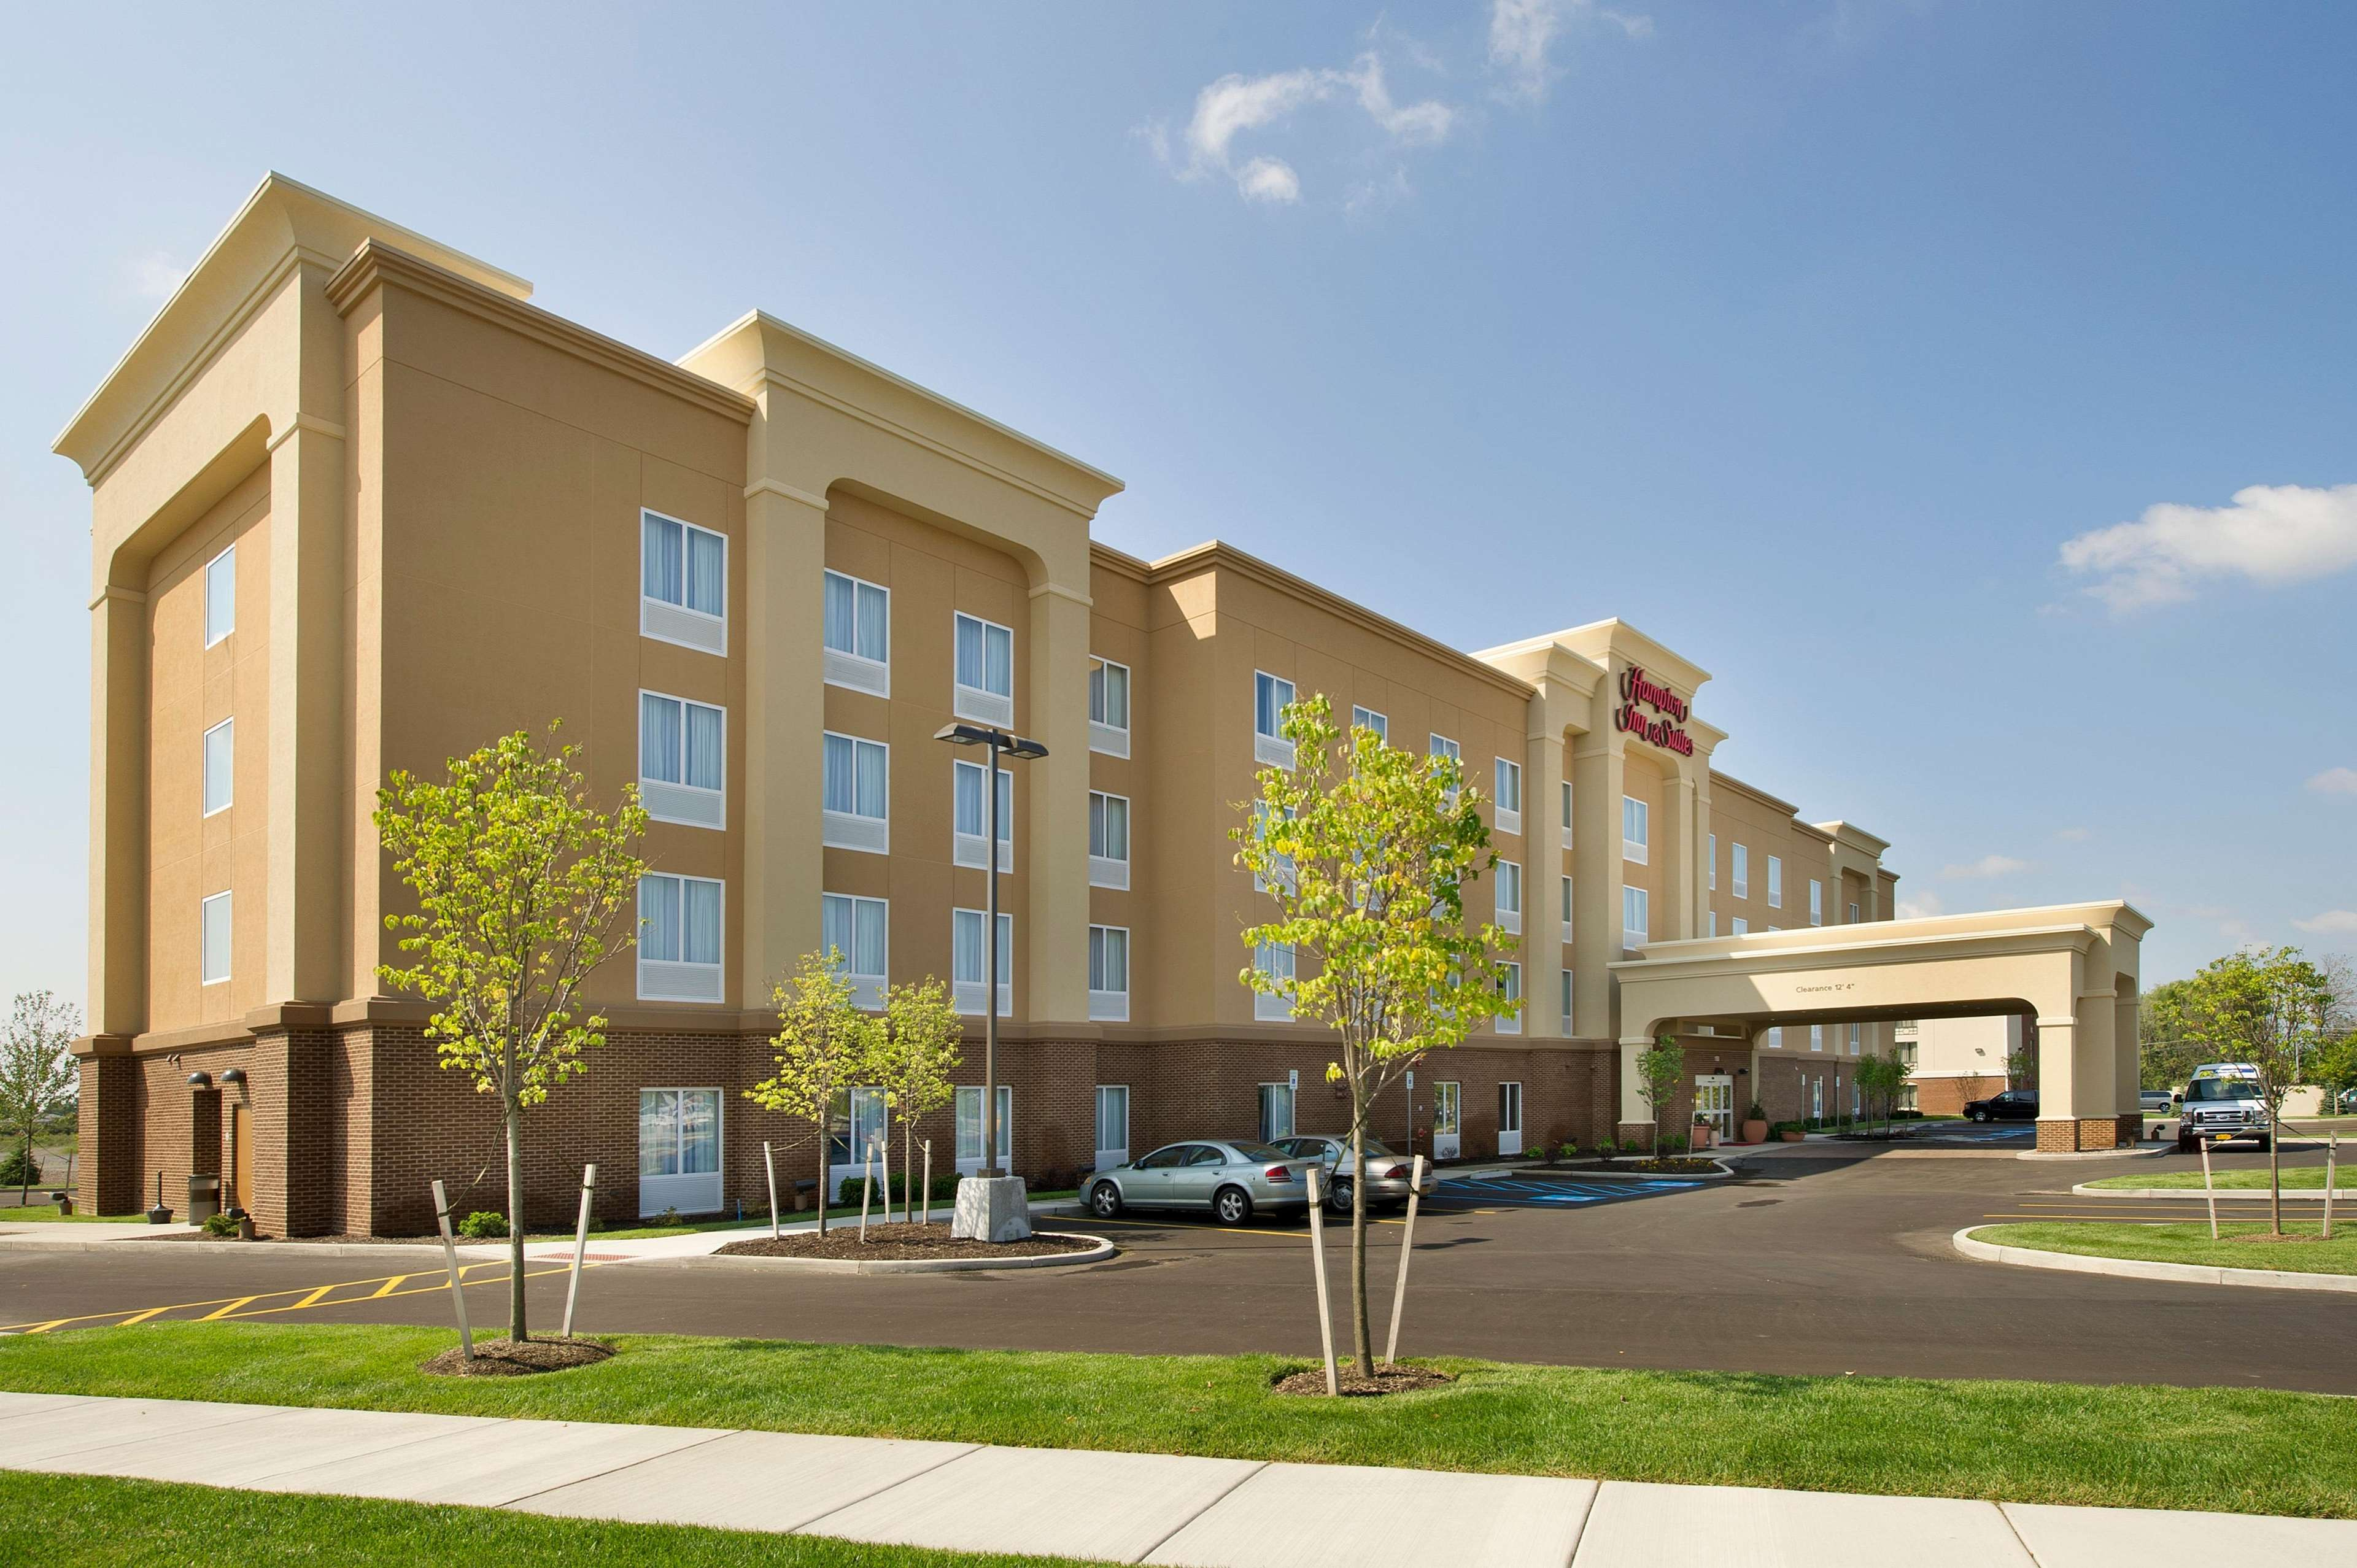 Hampton Inn & Suites Buffalo Airport image 0